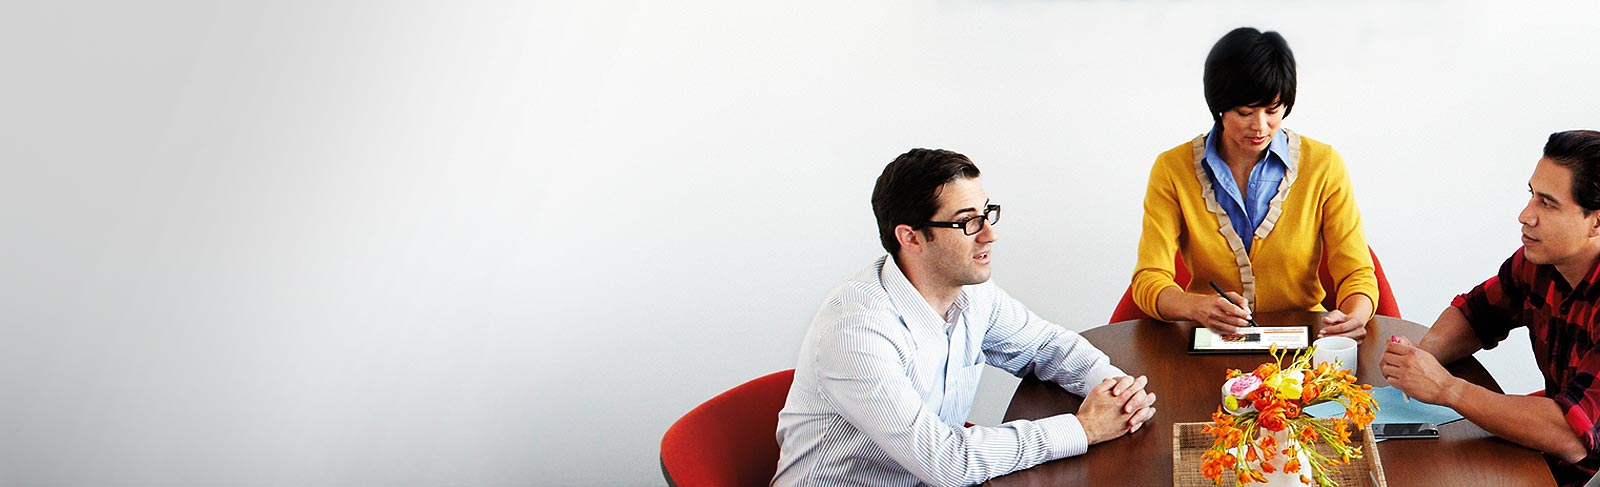 Smarter Business Group NonProfit